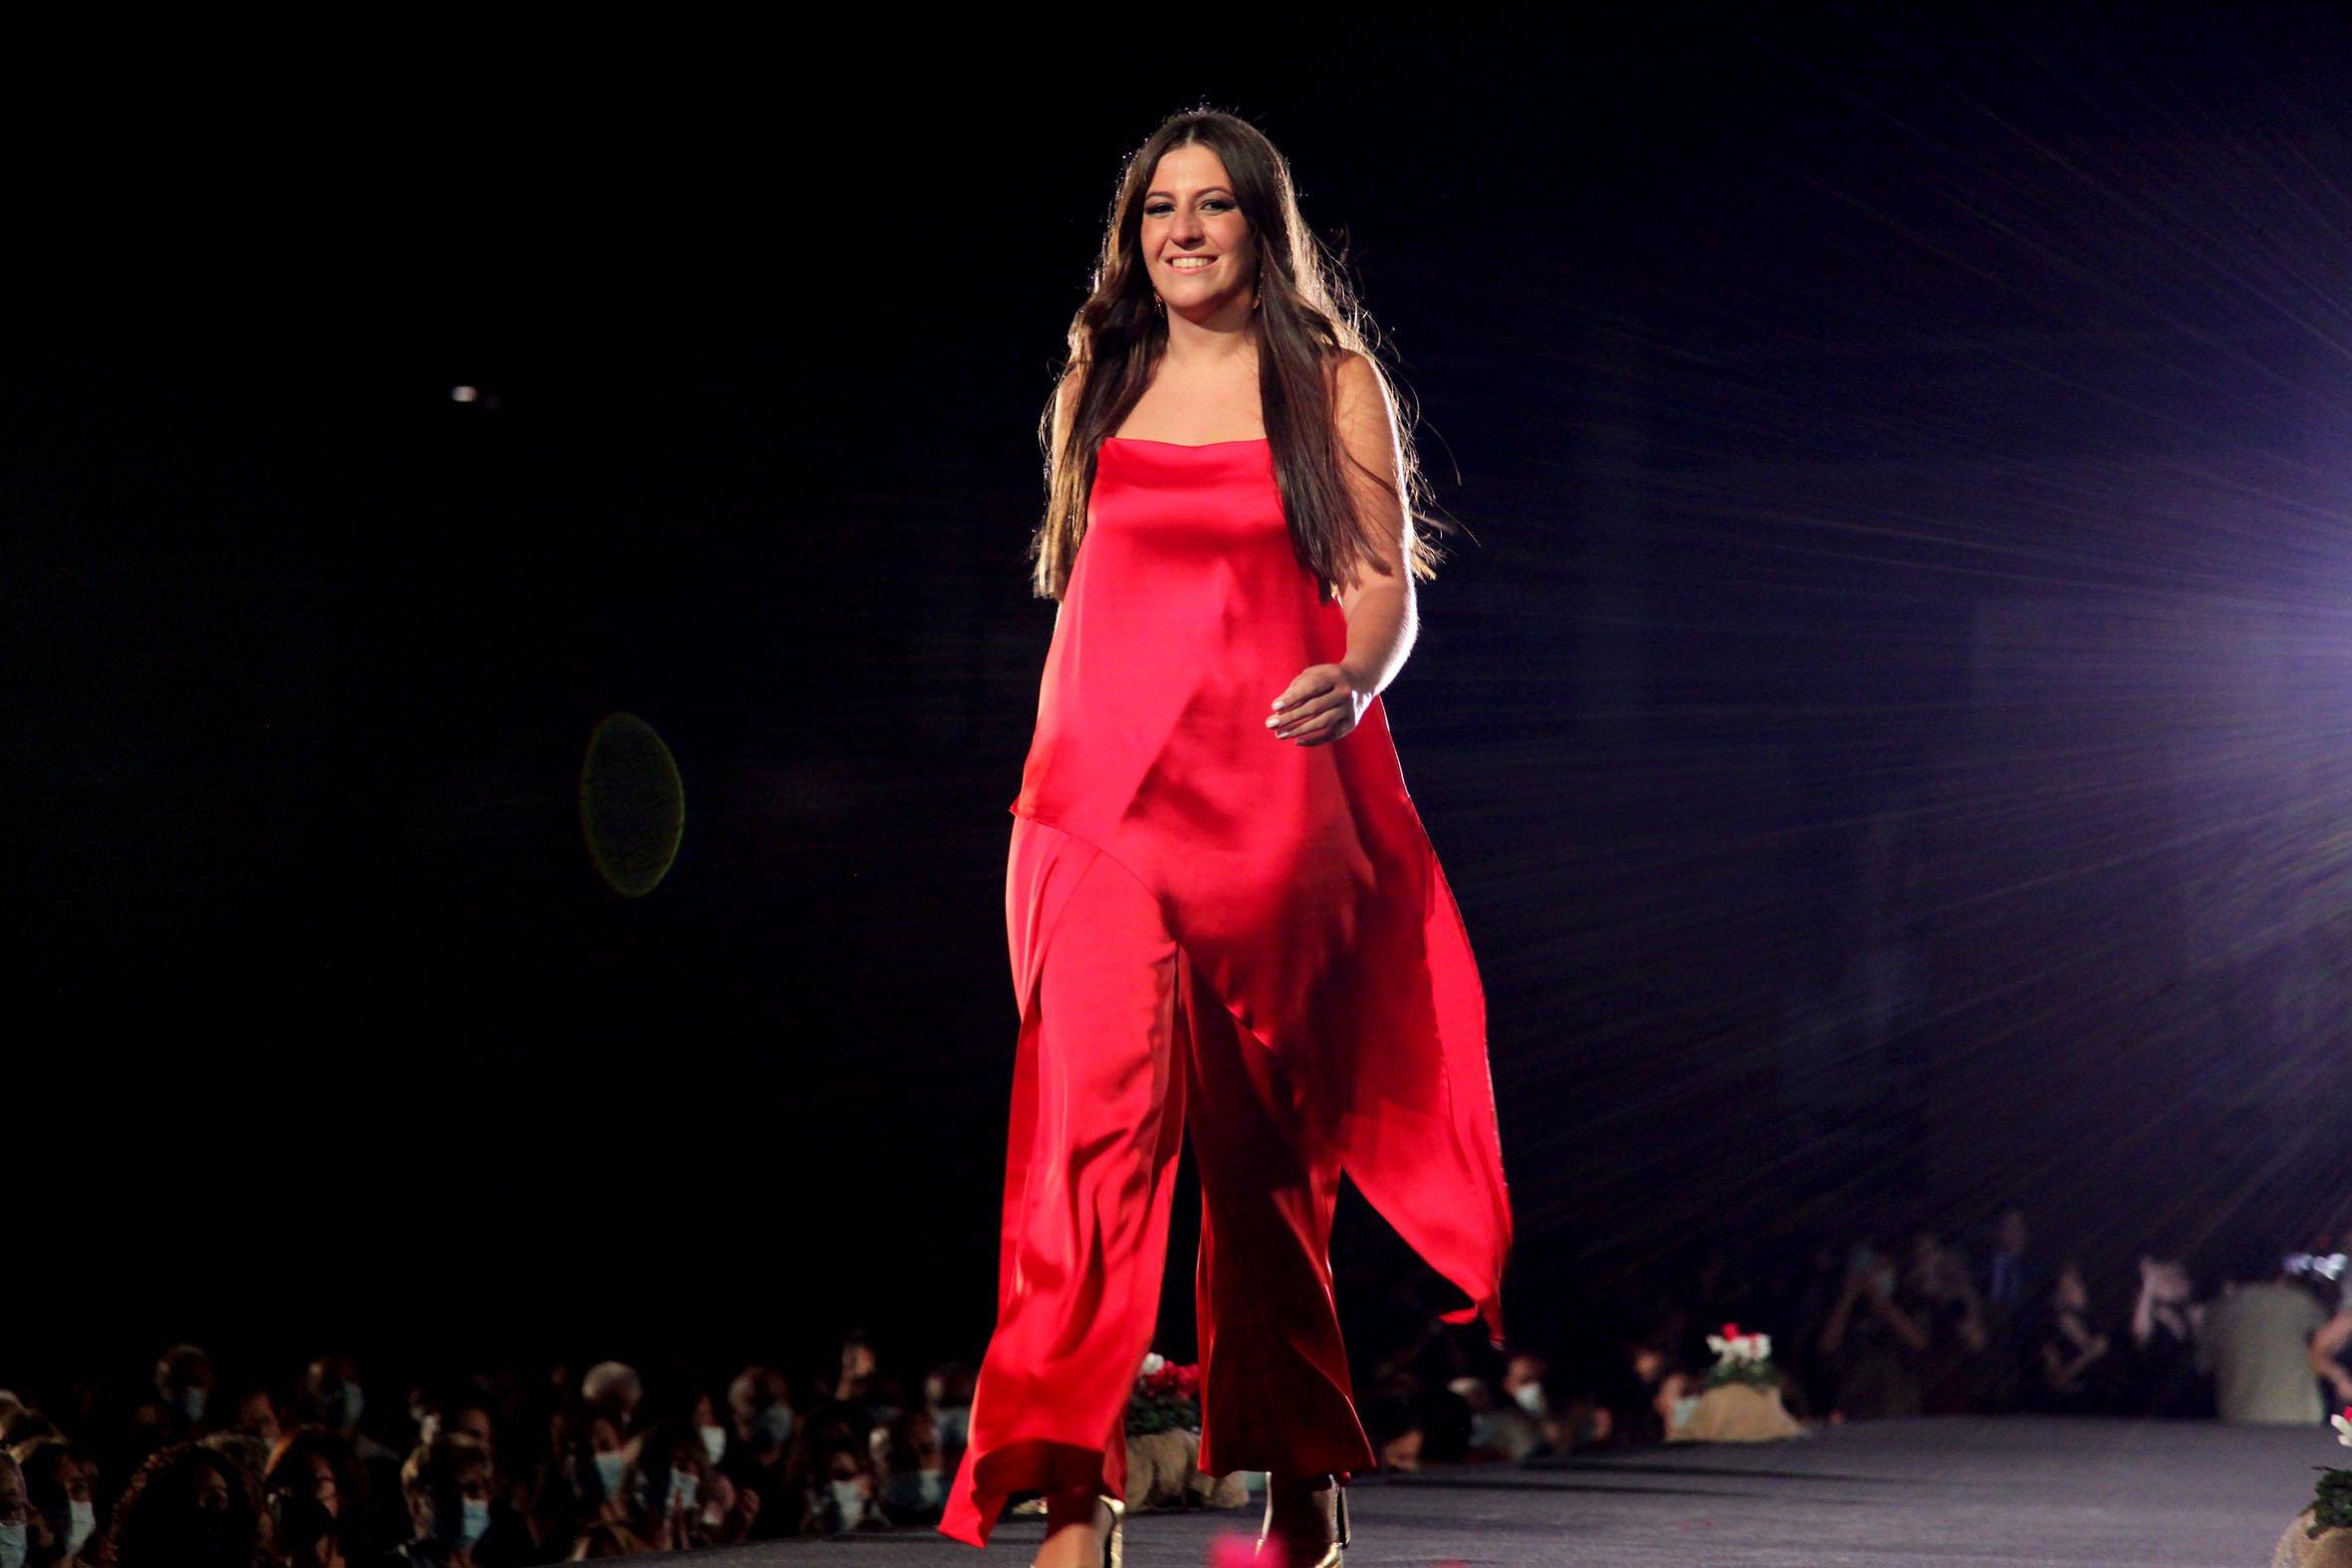 Olivia Clemente, Reina de la Foguera 2022